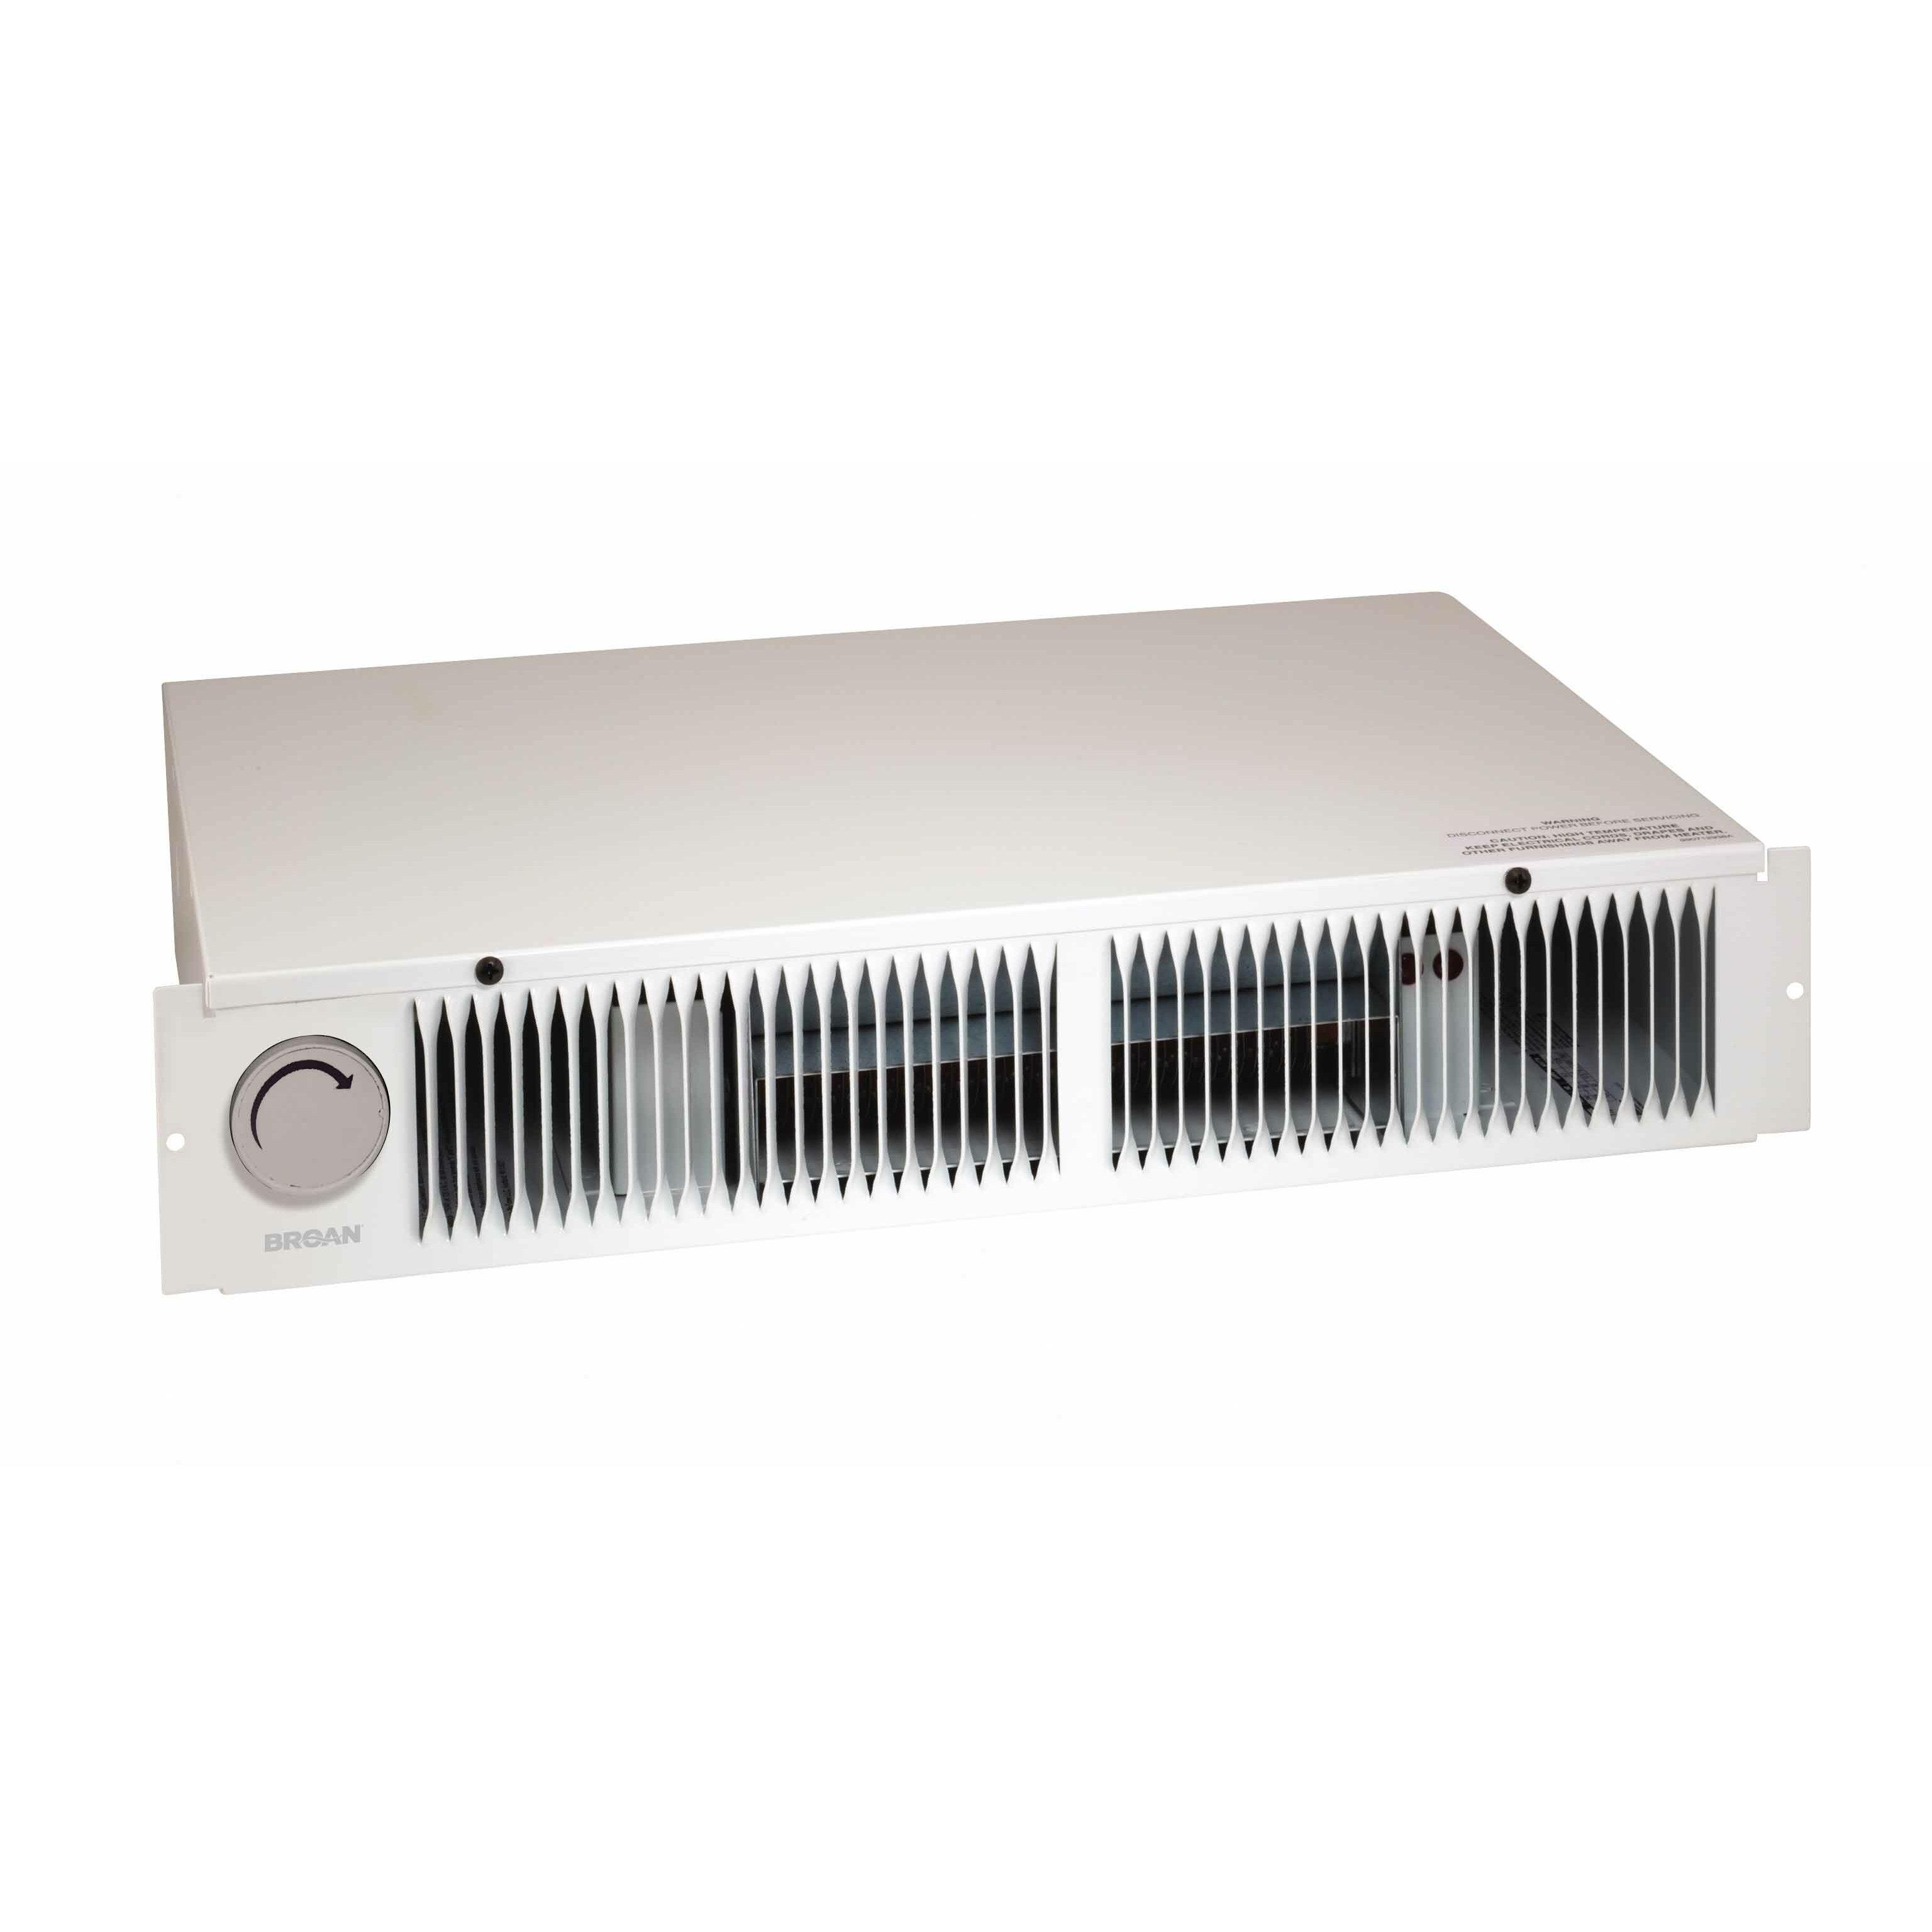 electric baseboard heater Cadet 240V Baseboard Heater Wiring Marley Electric Baseboard Heaters Wiring-Diagram